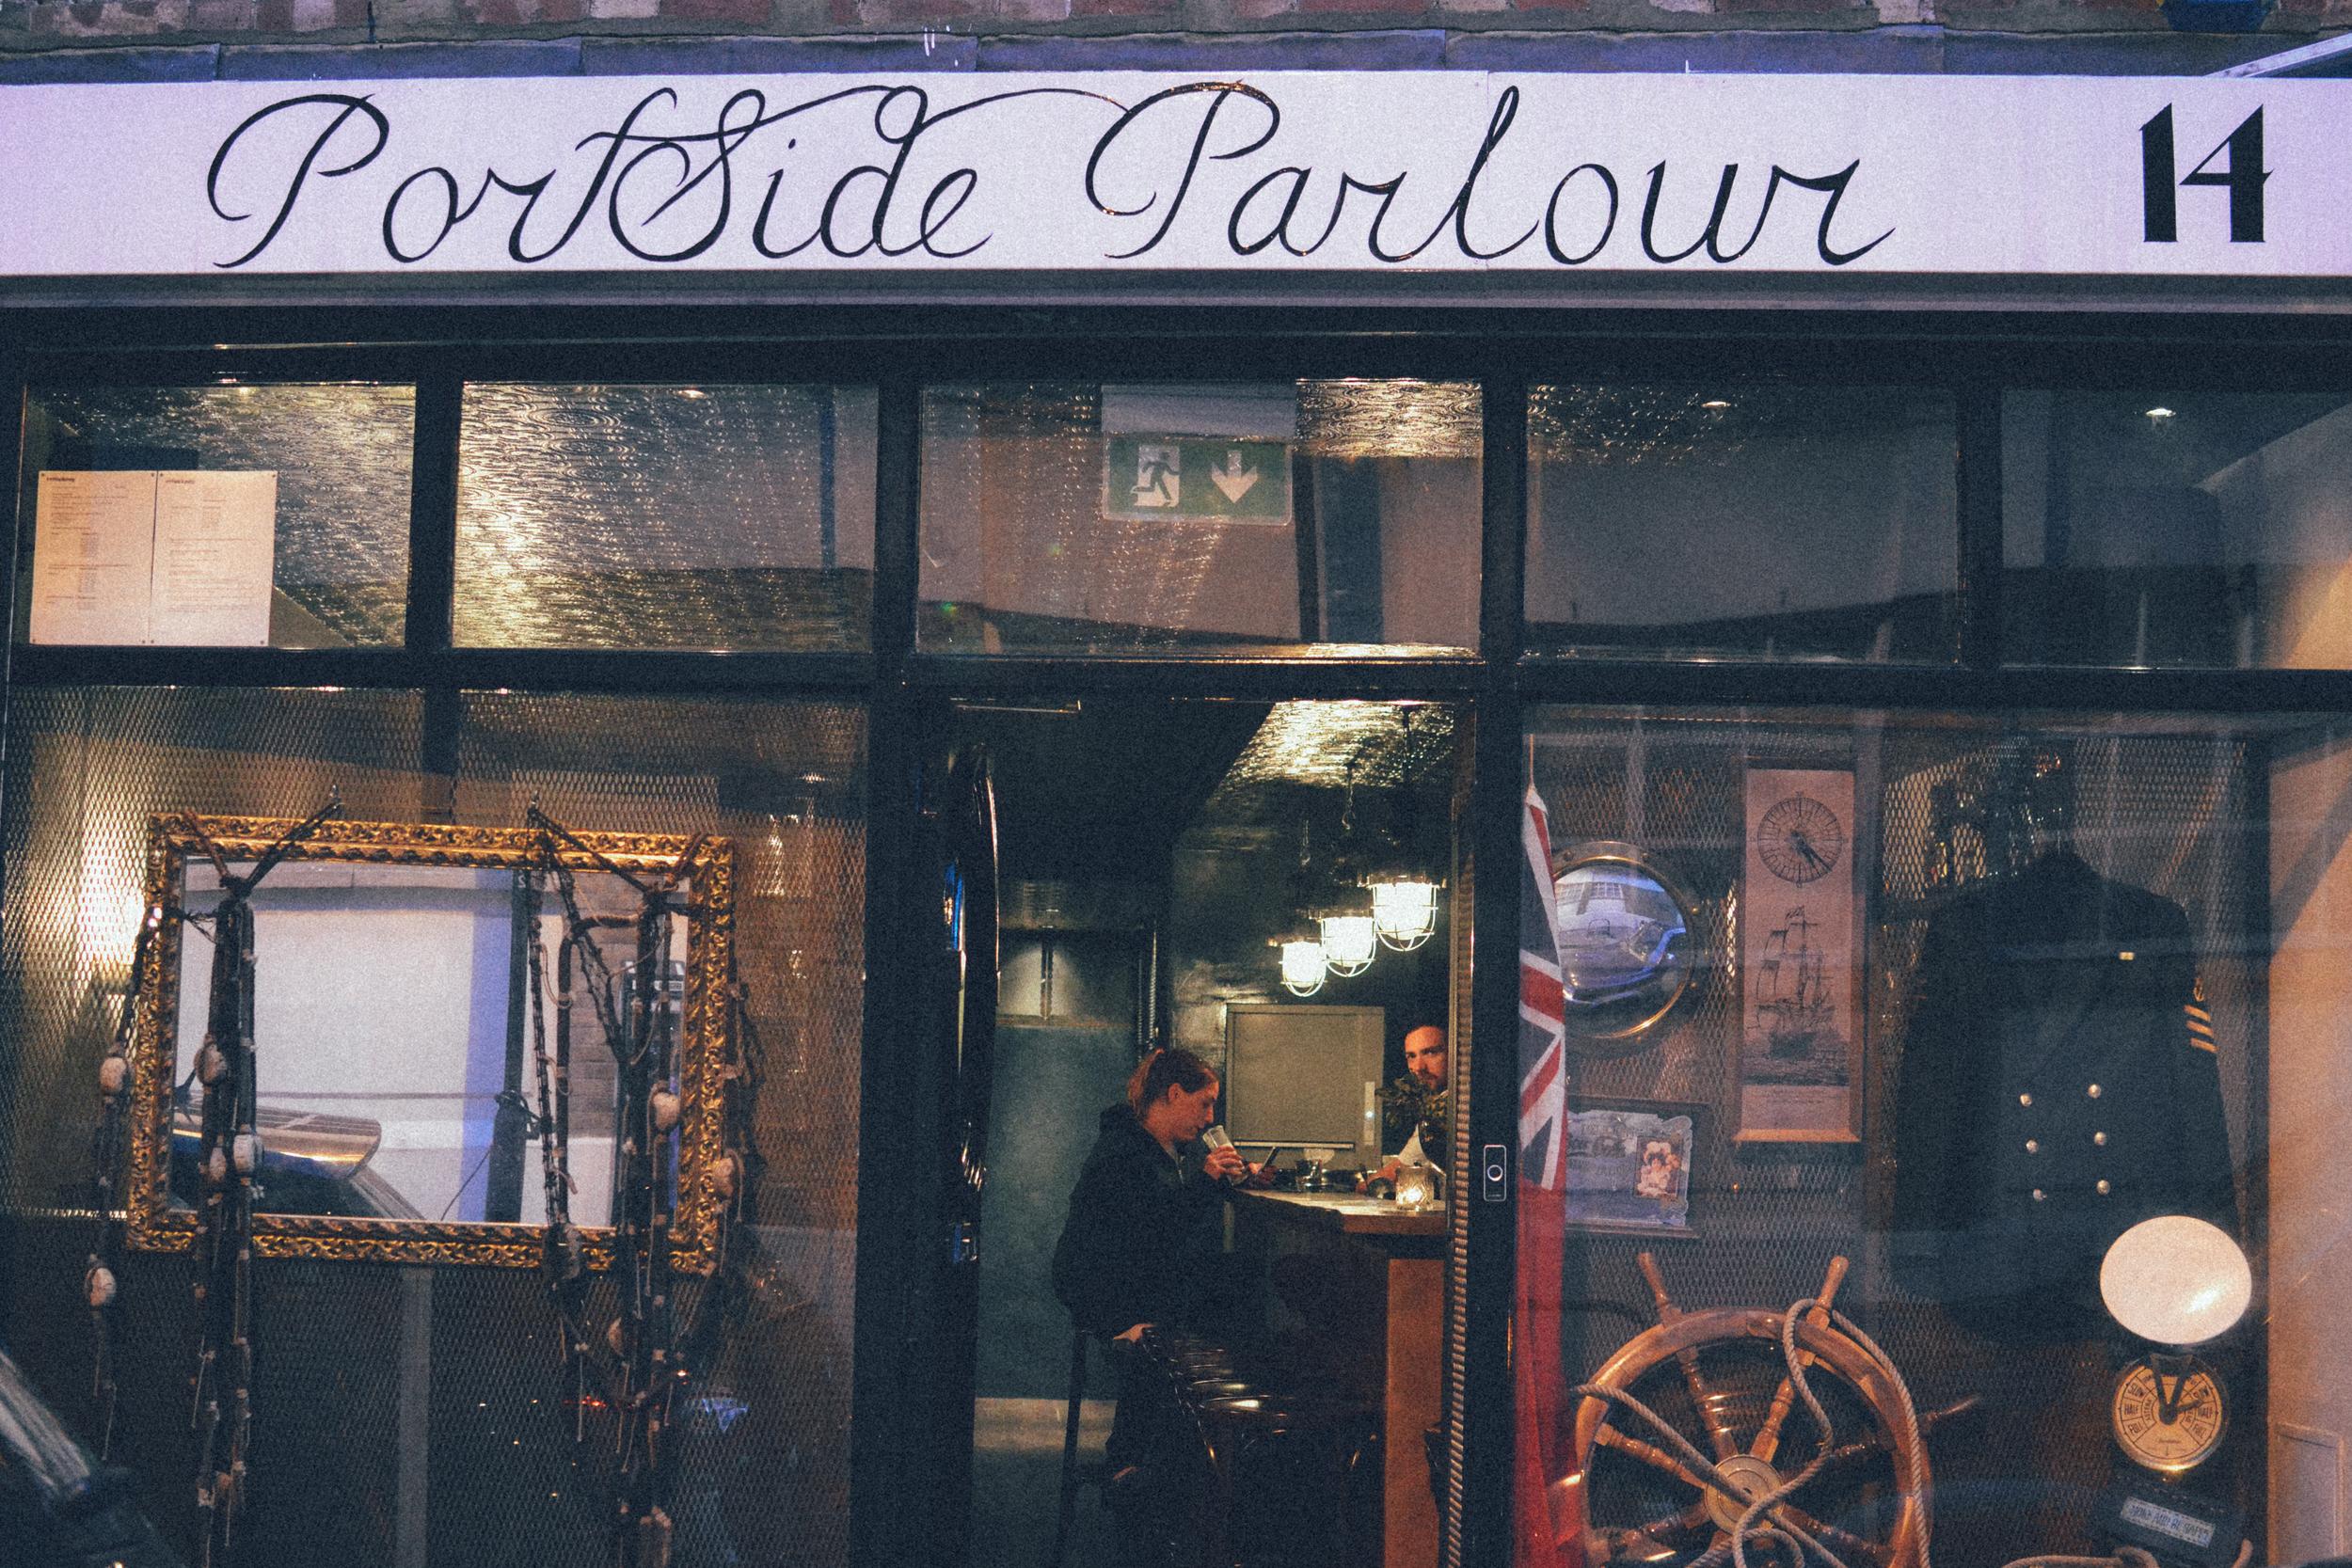 Portside Parlour Voyage Collective